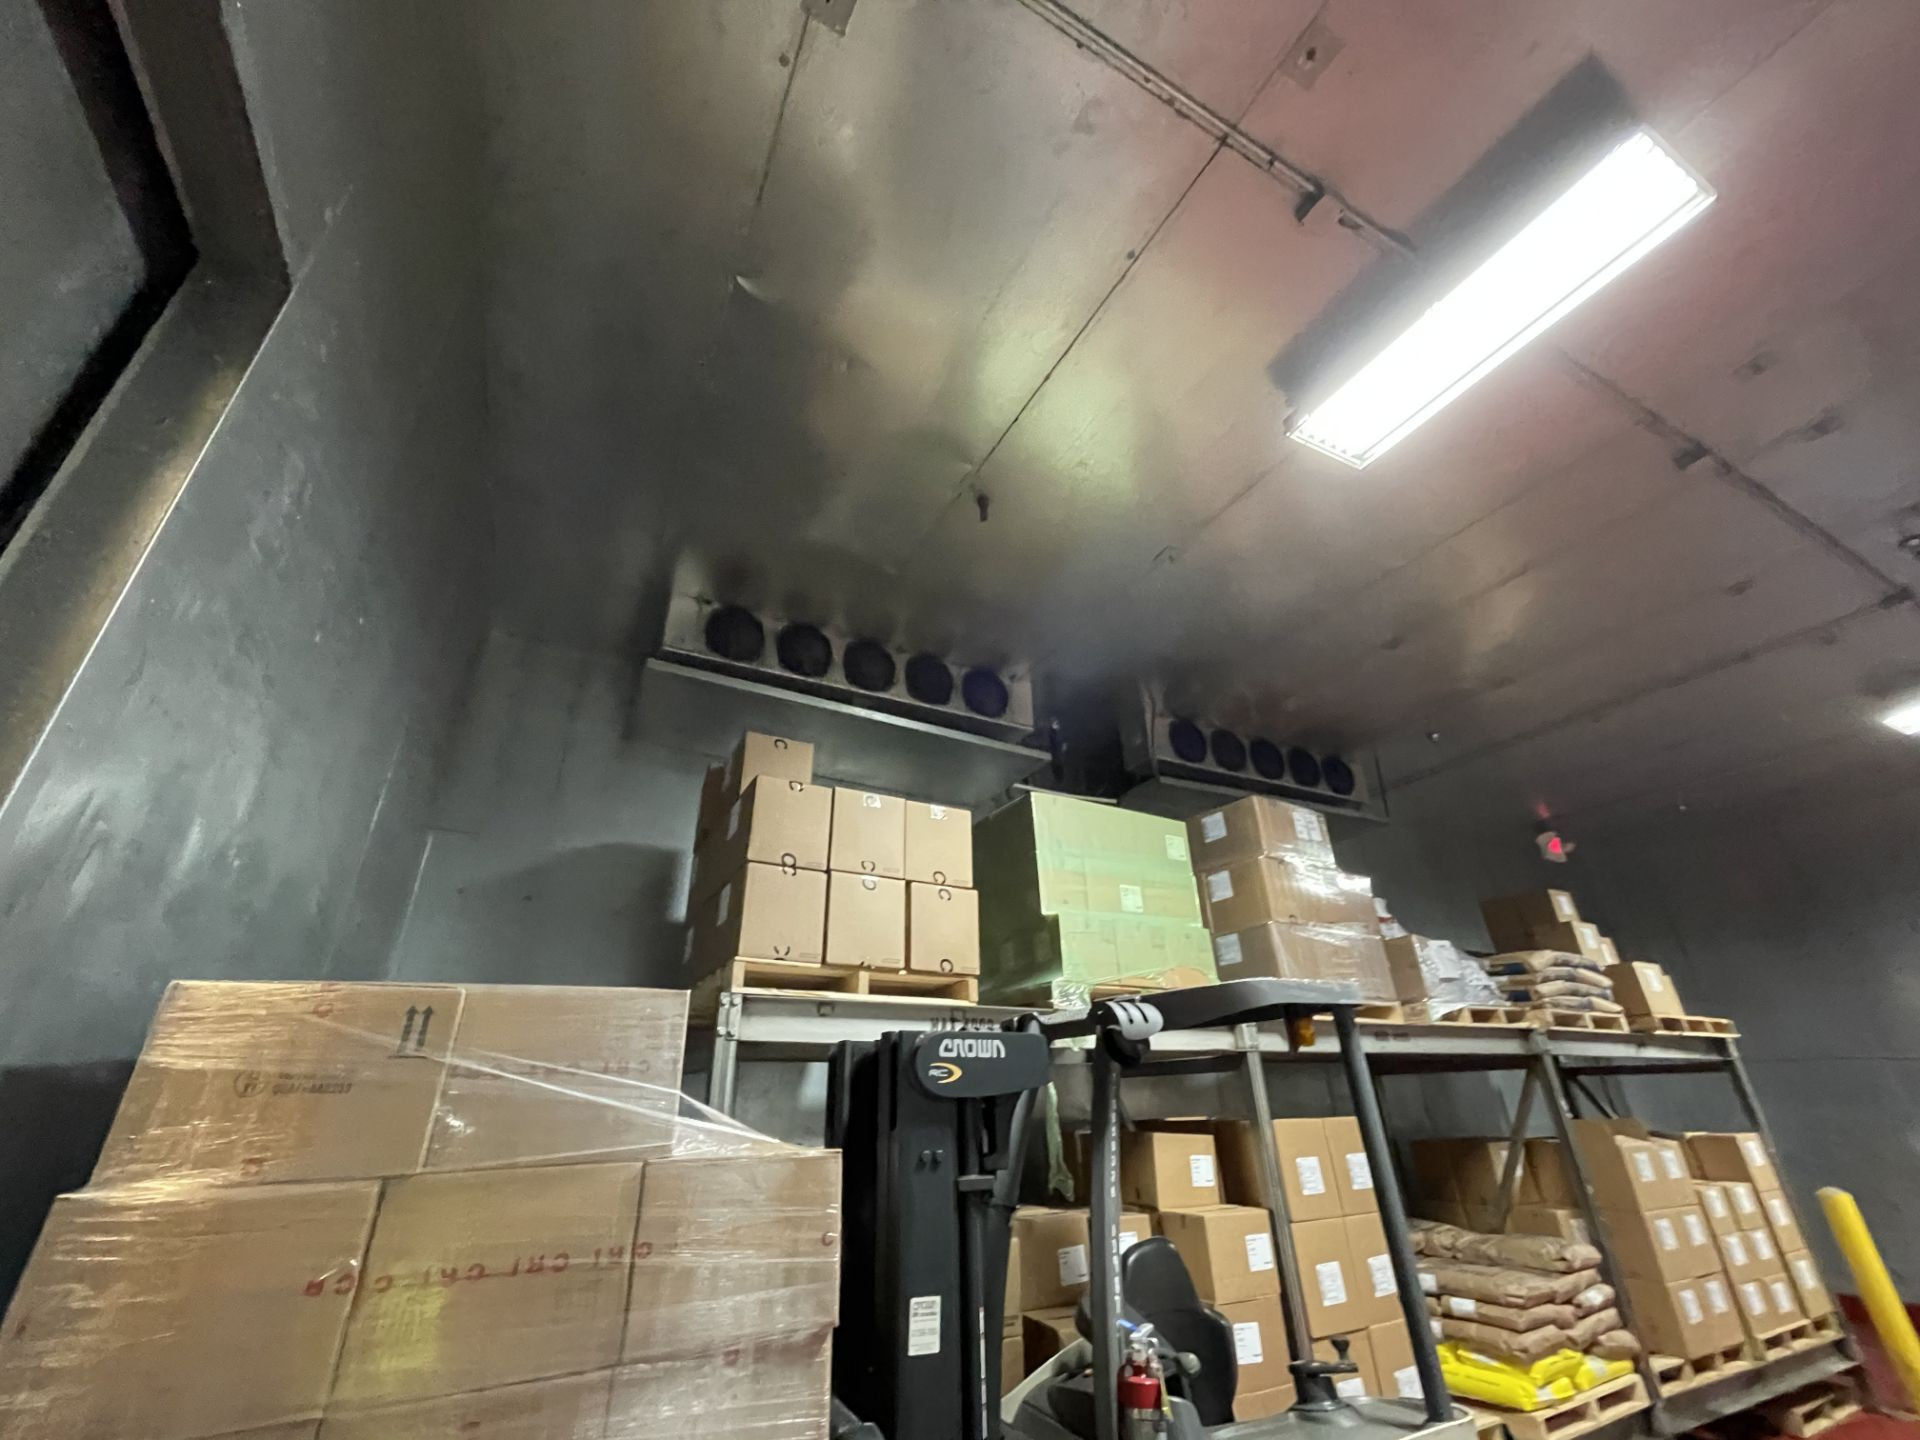 37x26 Cold Storage Room - Image 3 of 7